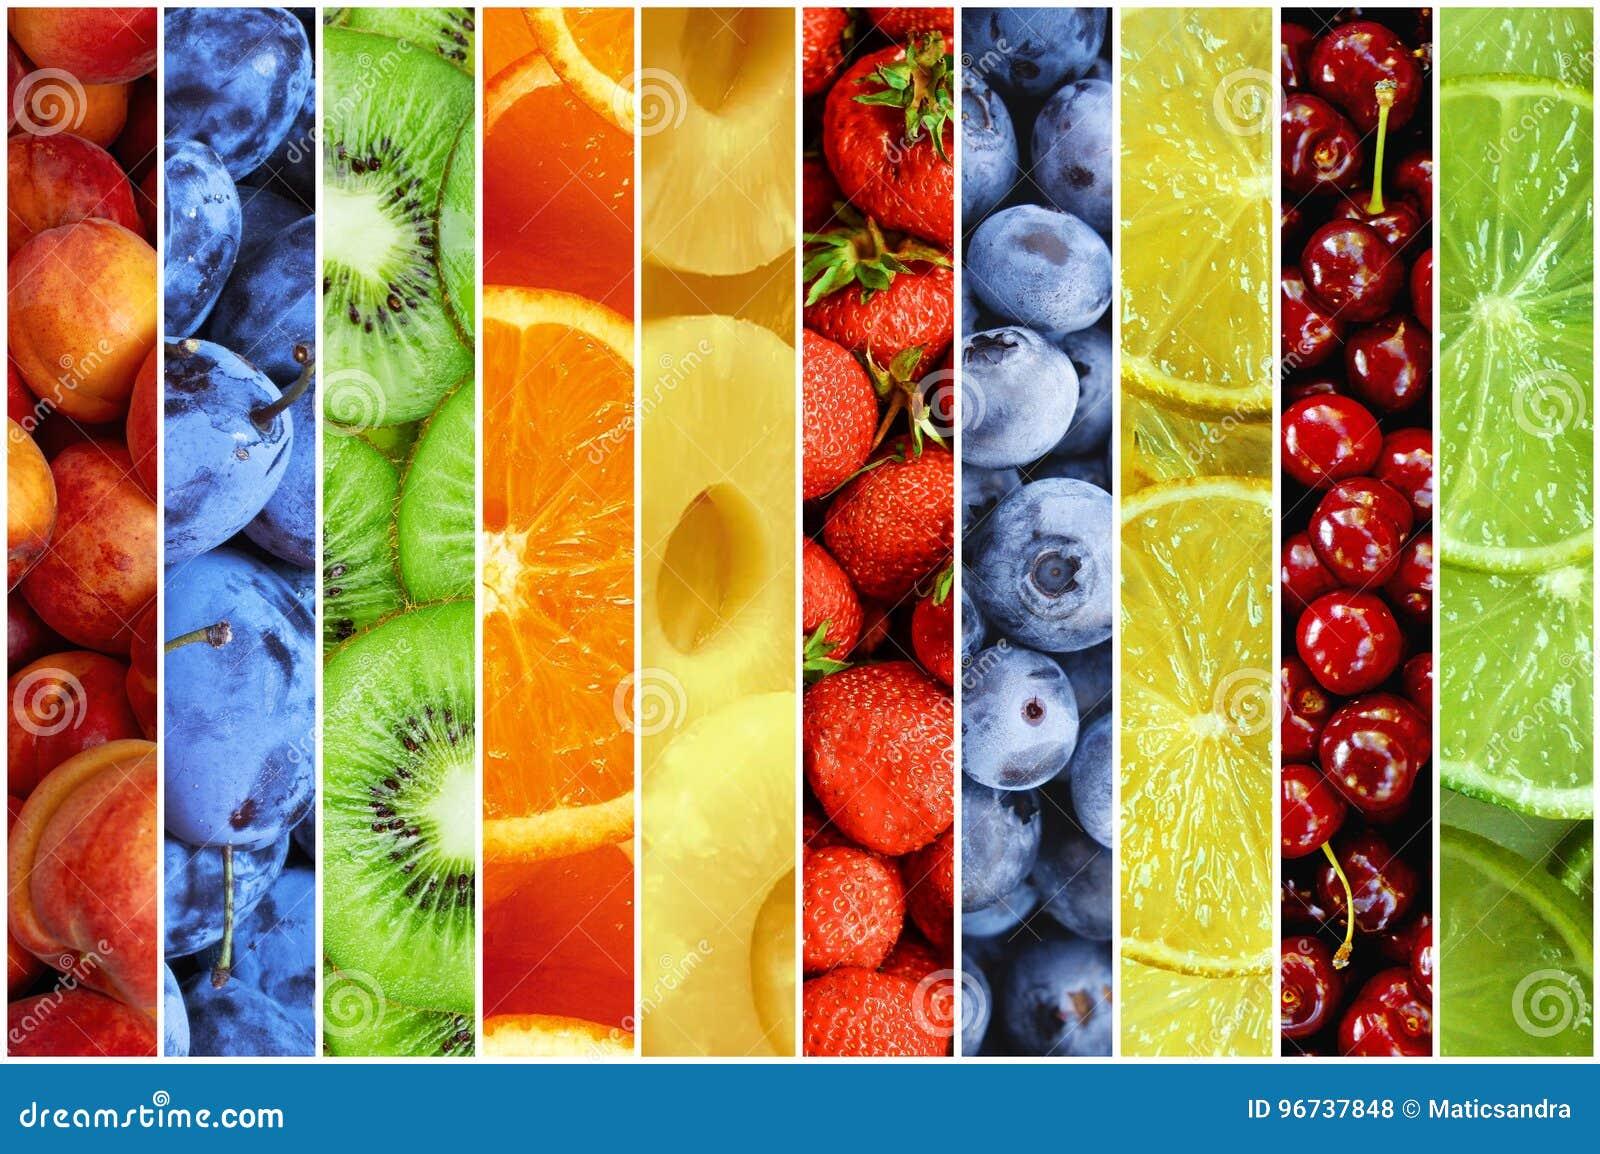 Collage av ny sommarfrukt i form av vertikala band